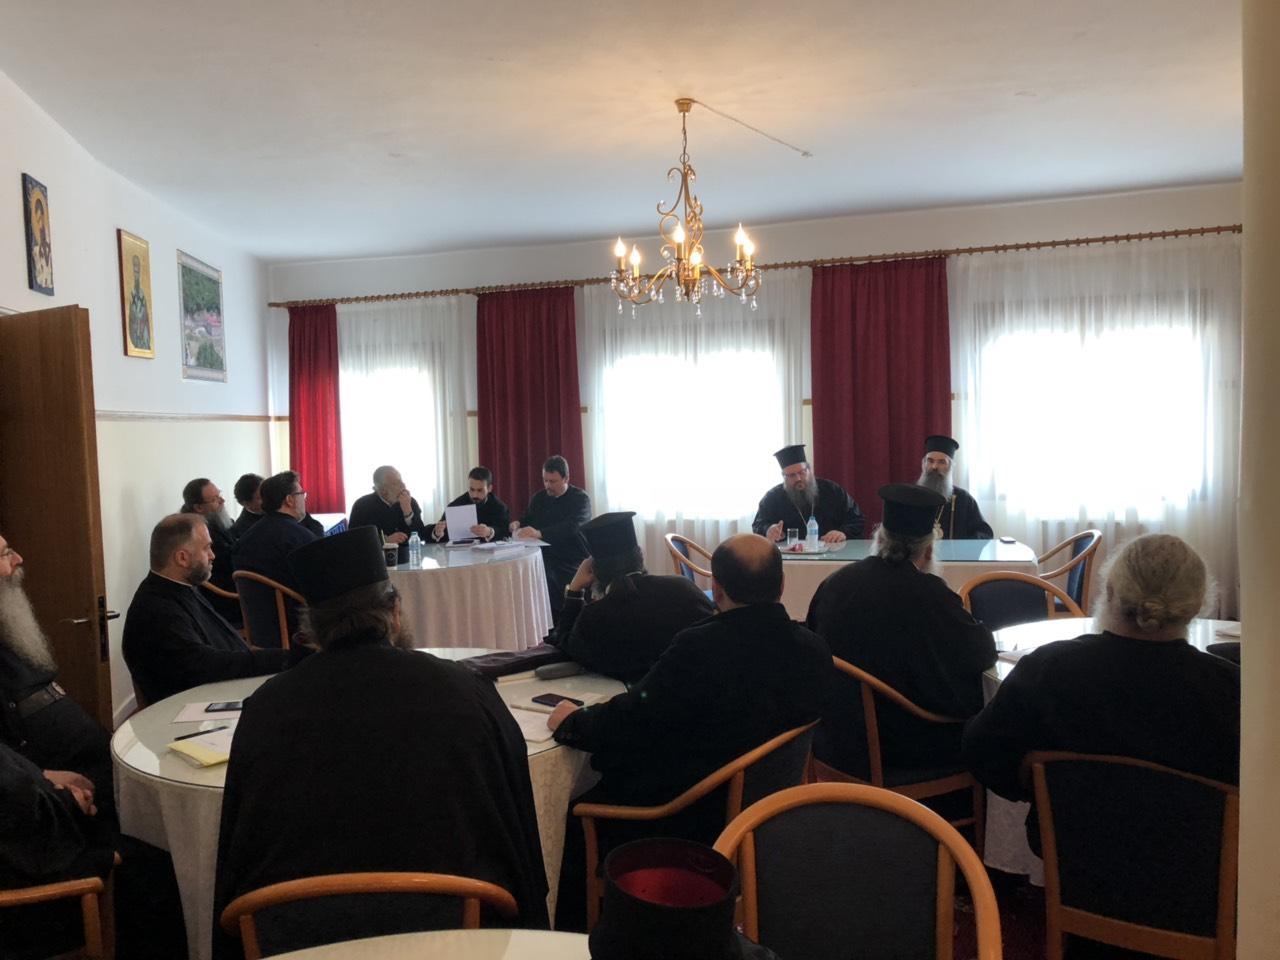 seminario elassona 2 - Ο Σεβασμιώτατος Ομιλητής Σε Επιμορφωτικό Σεμιναριο Στην Ιερά Μητρόπολη Ελασσώνος